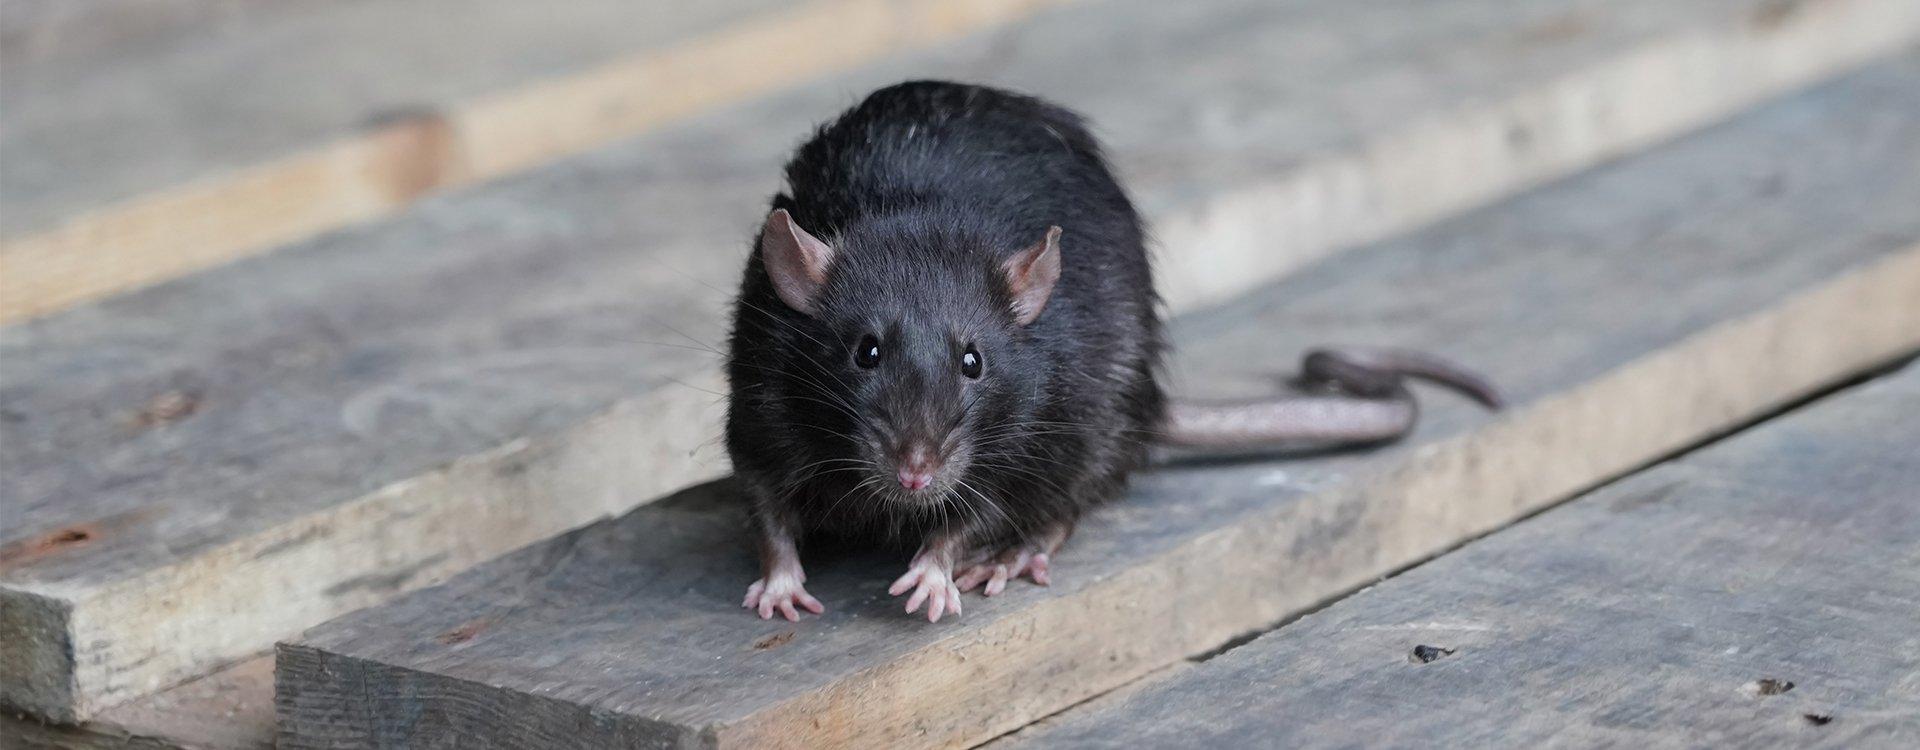 rat on a pallet